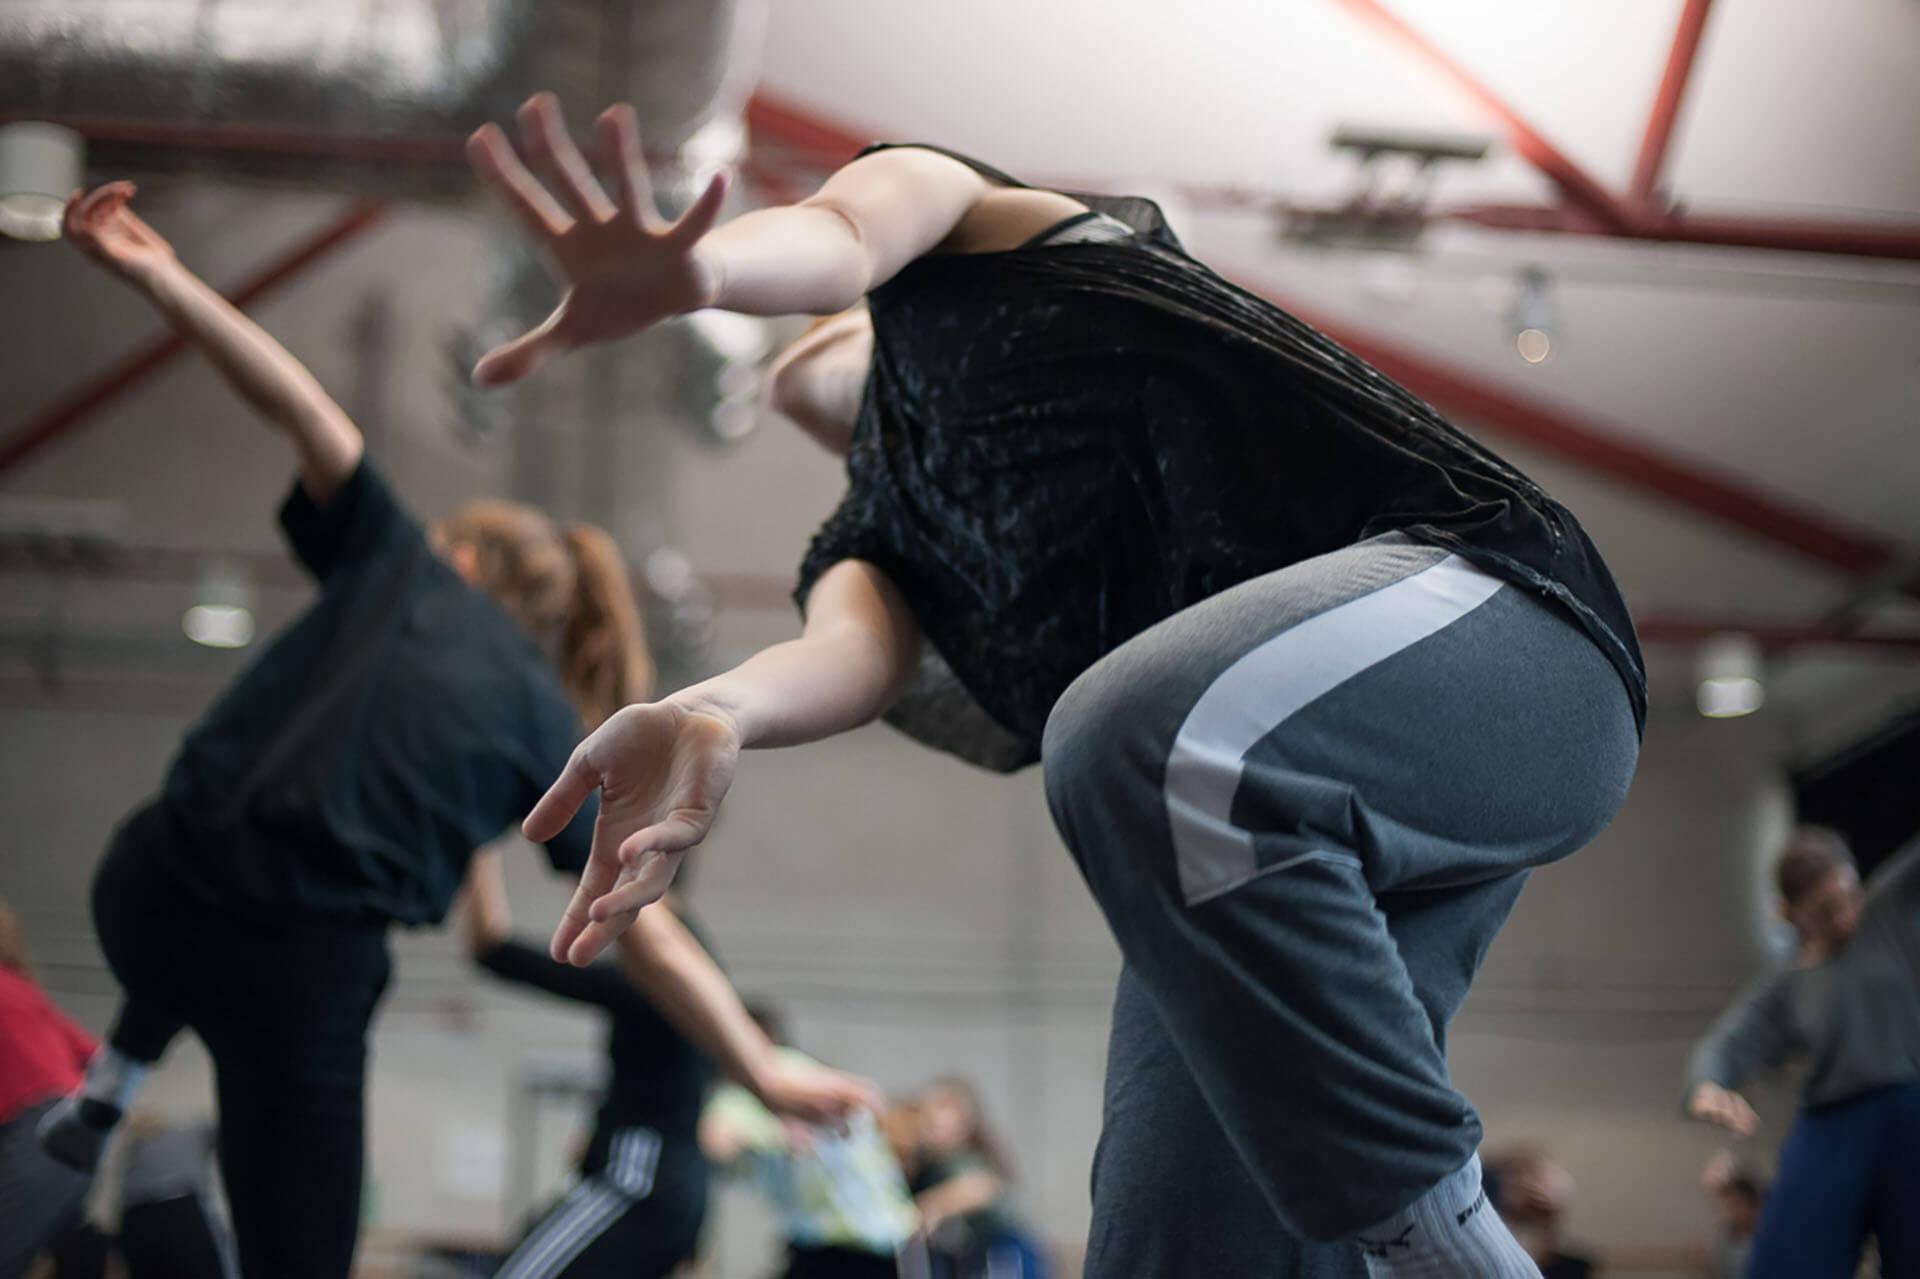 Hsc Intensive Photo (c) Chris Nash.min